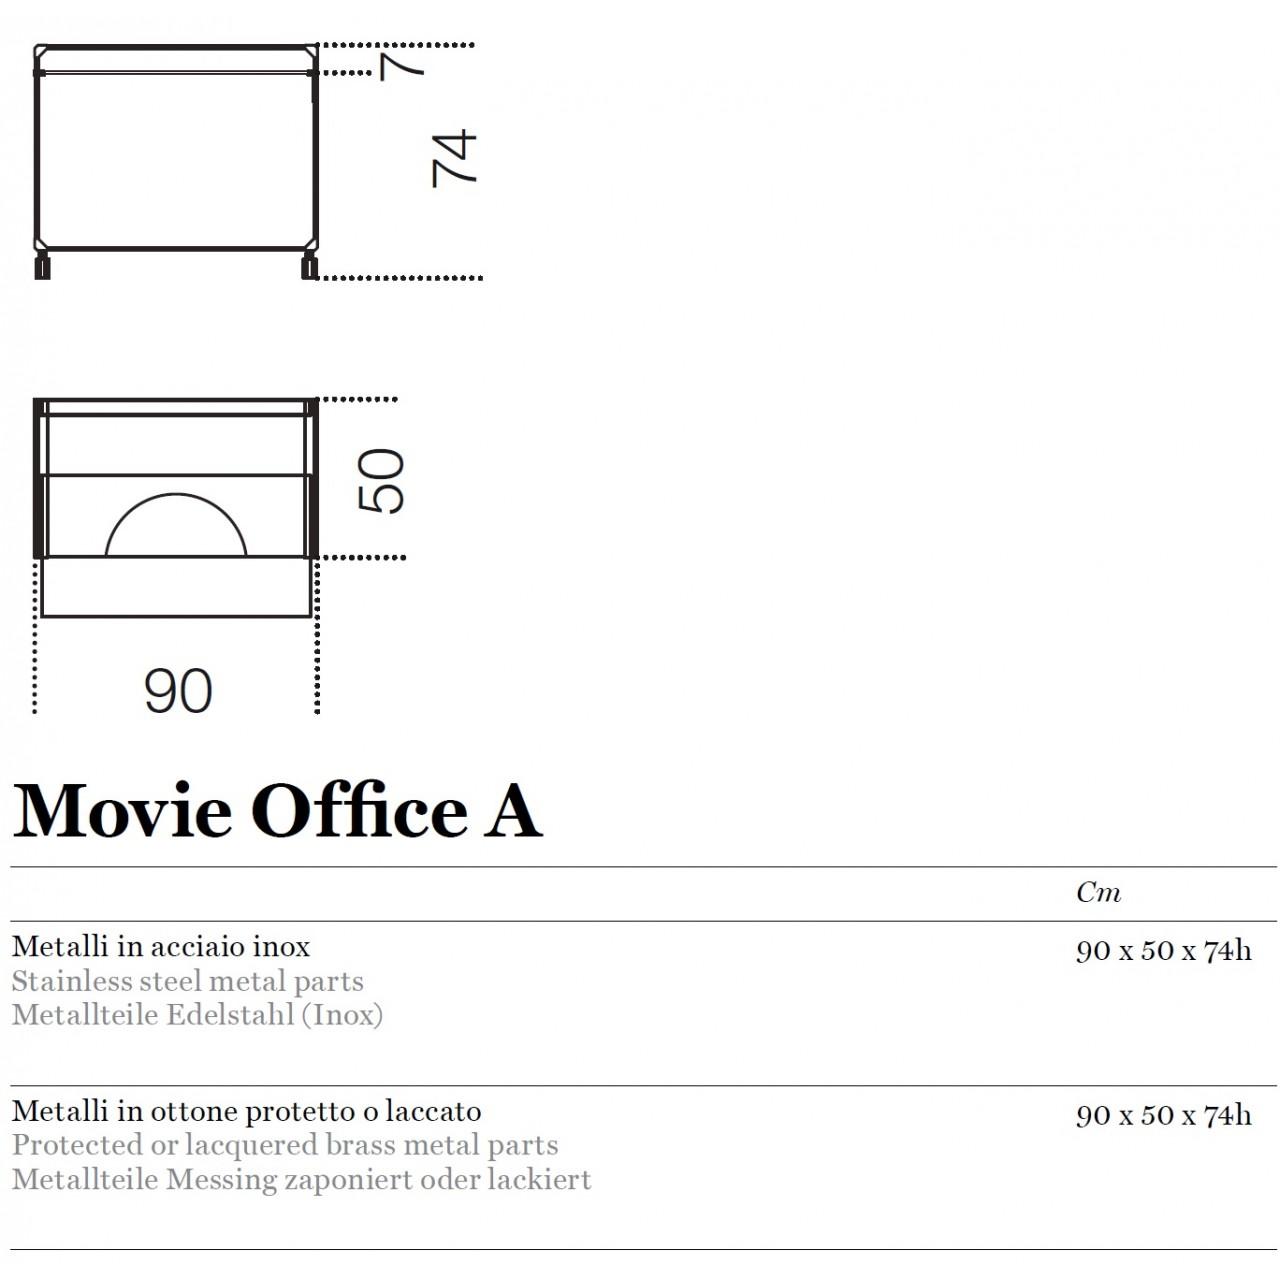 Movie Office